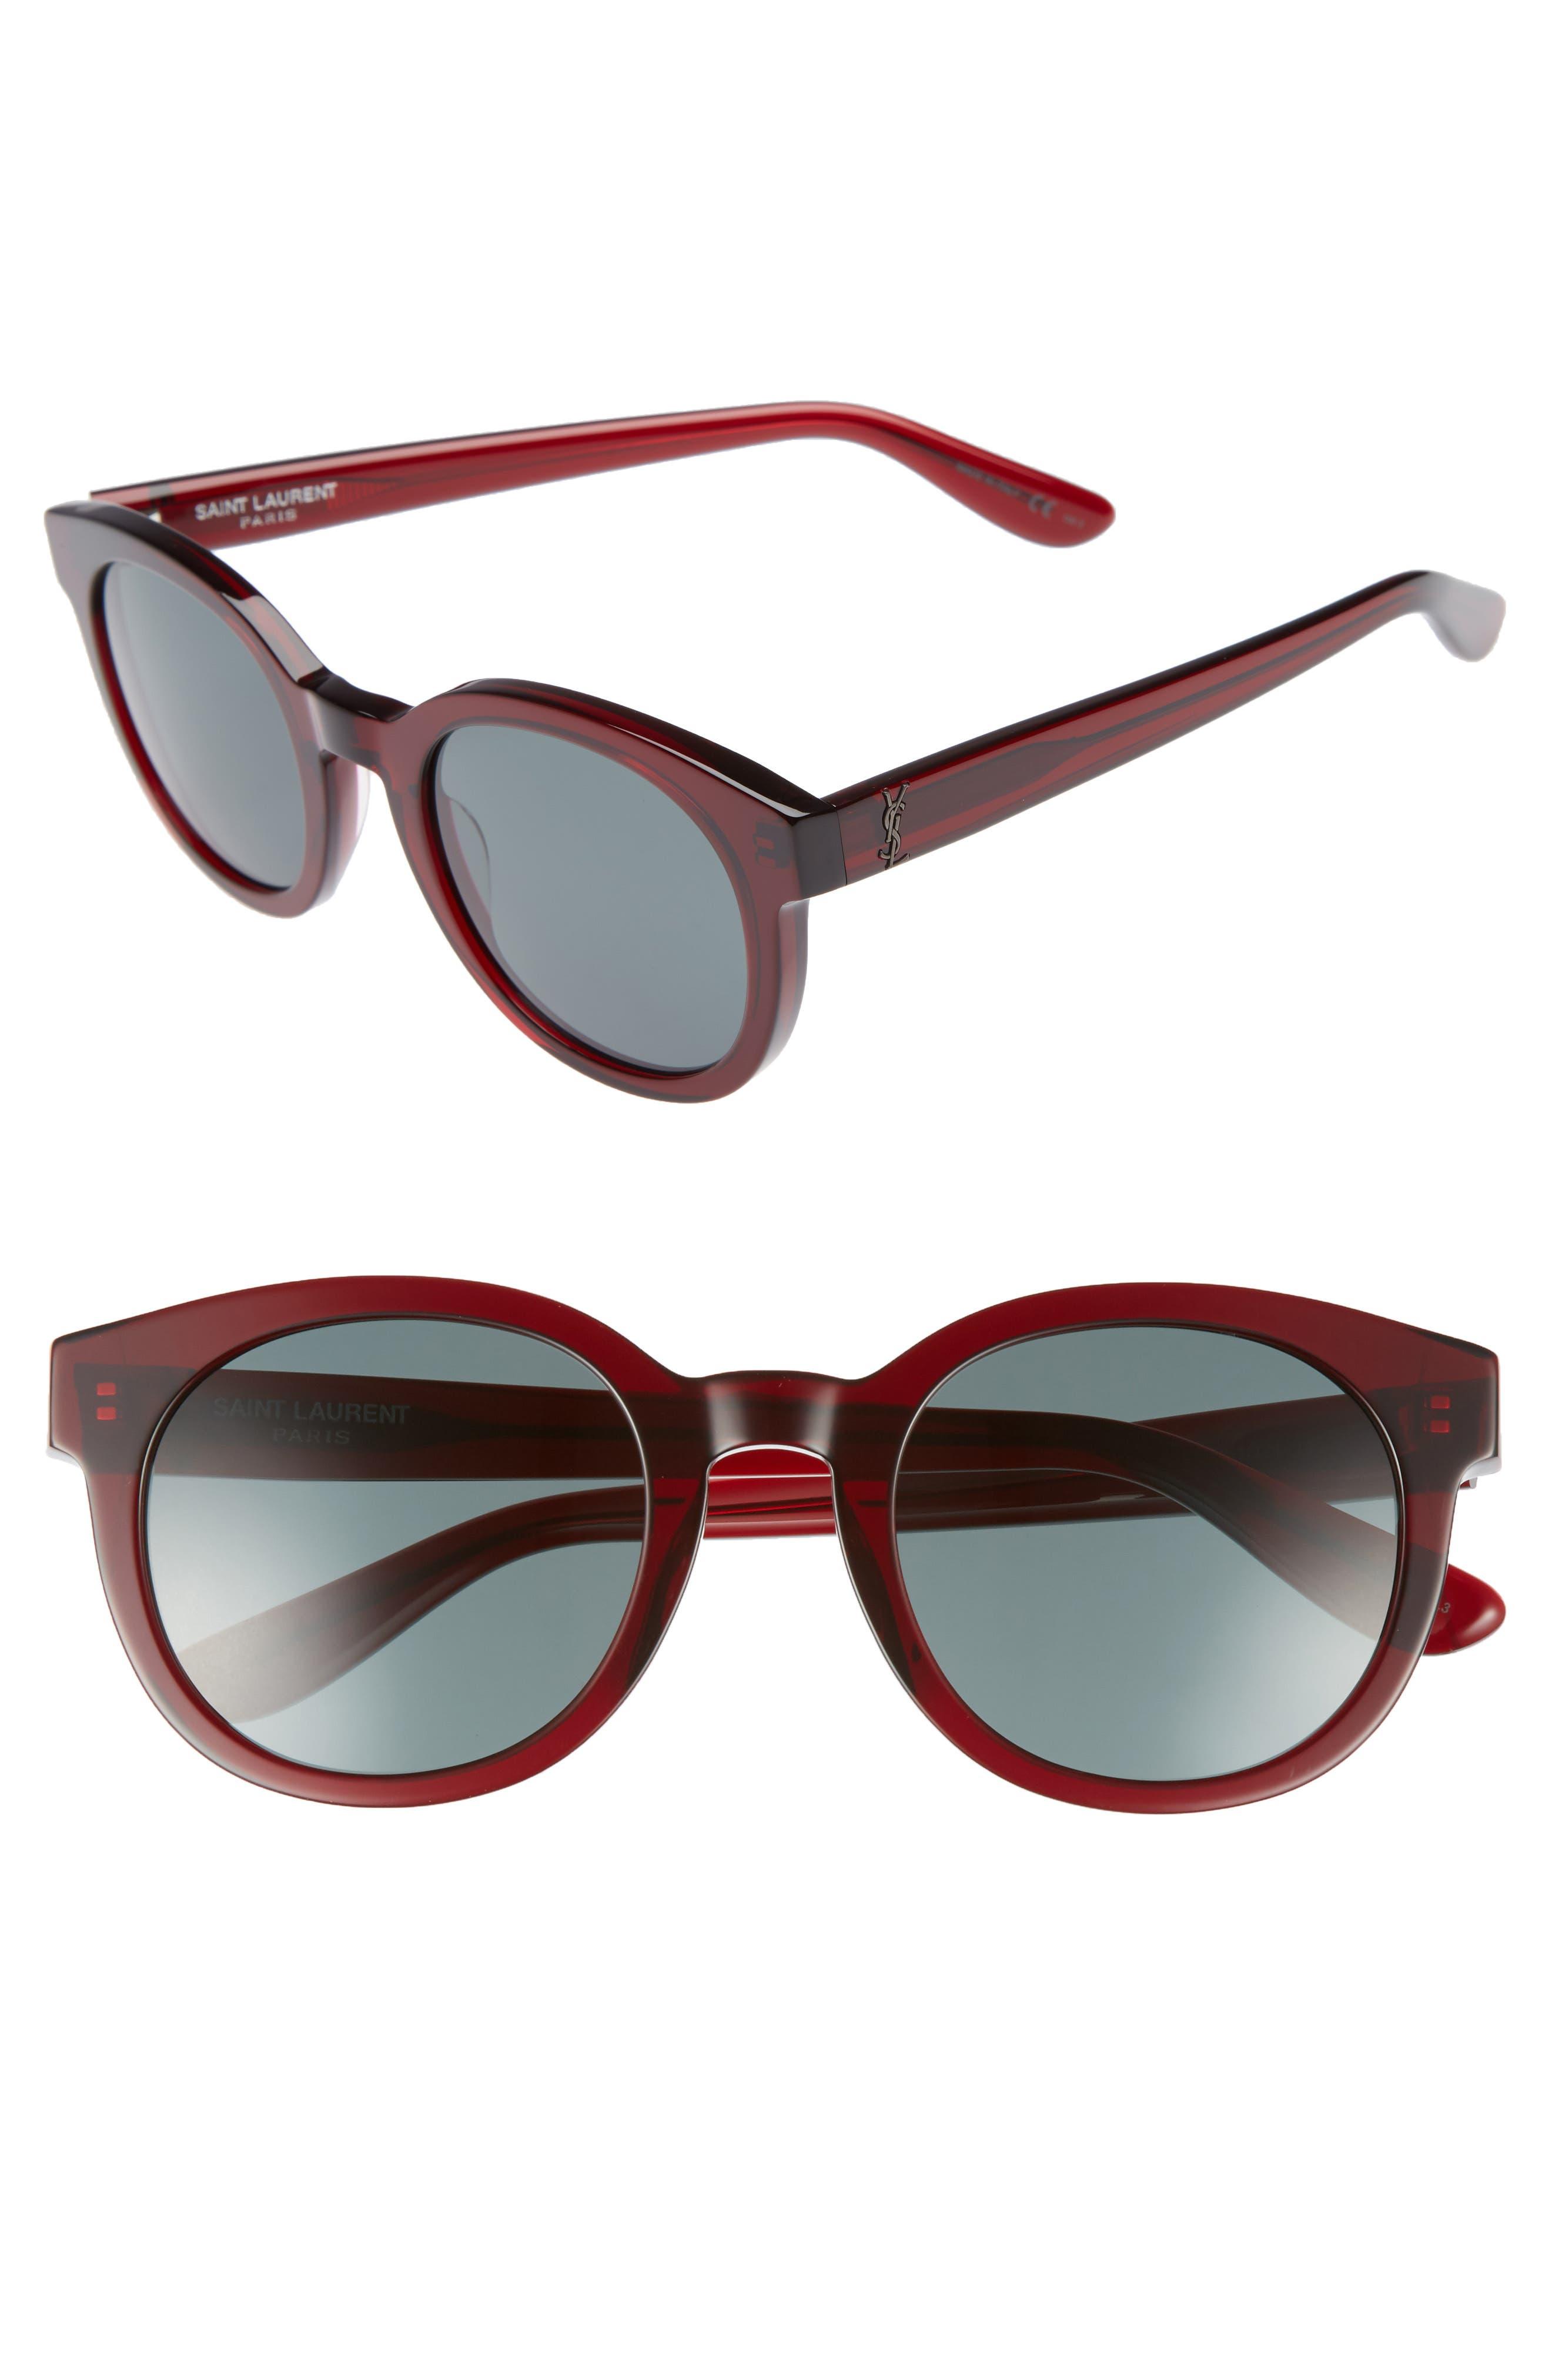 51mm Round Sunglasses,                             Main thumbnail 1, color,                             Burgundy